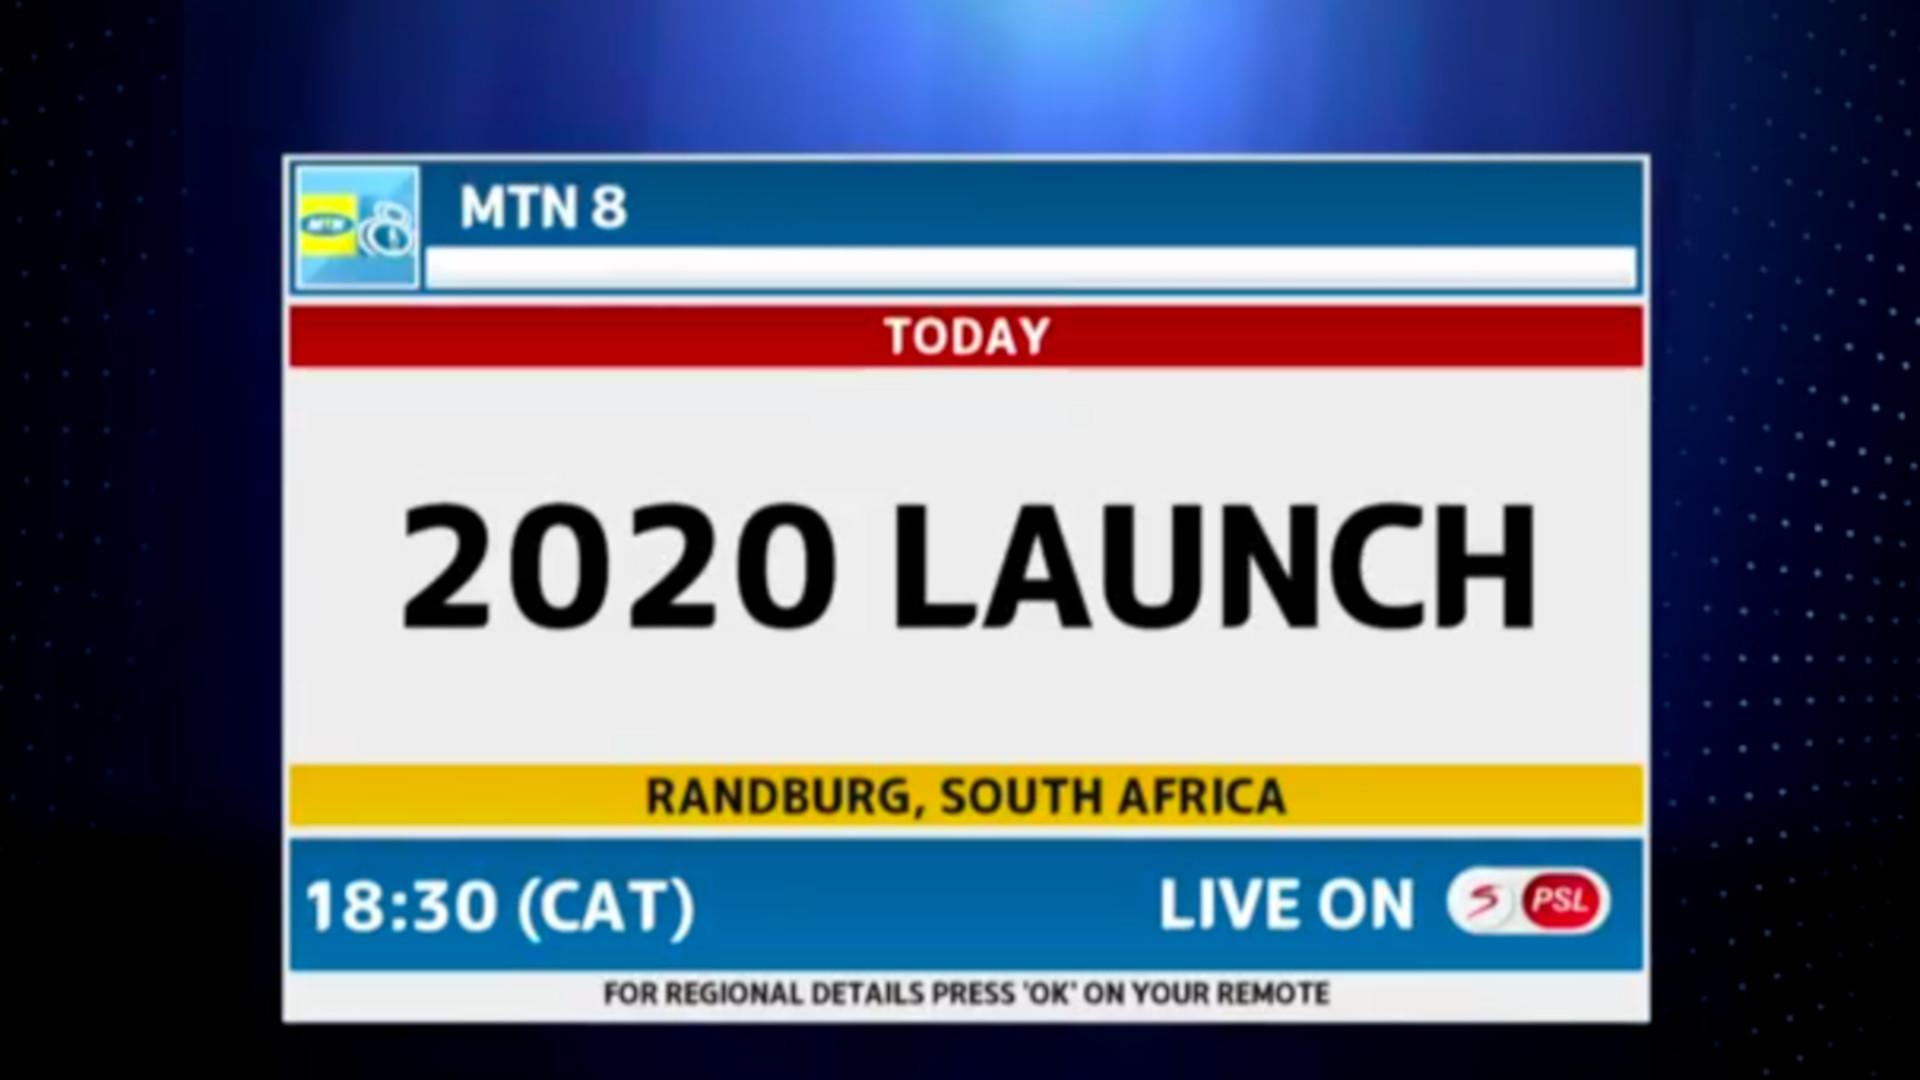 MTN8 | MTN 8 Launch